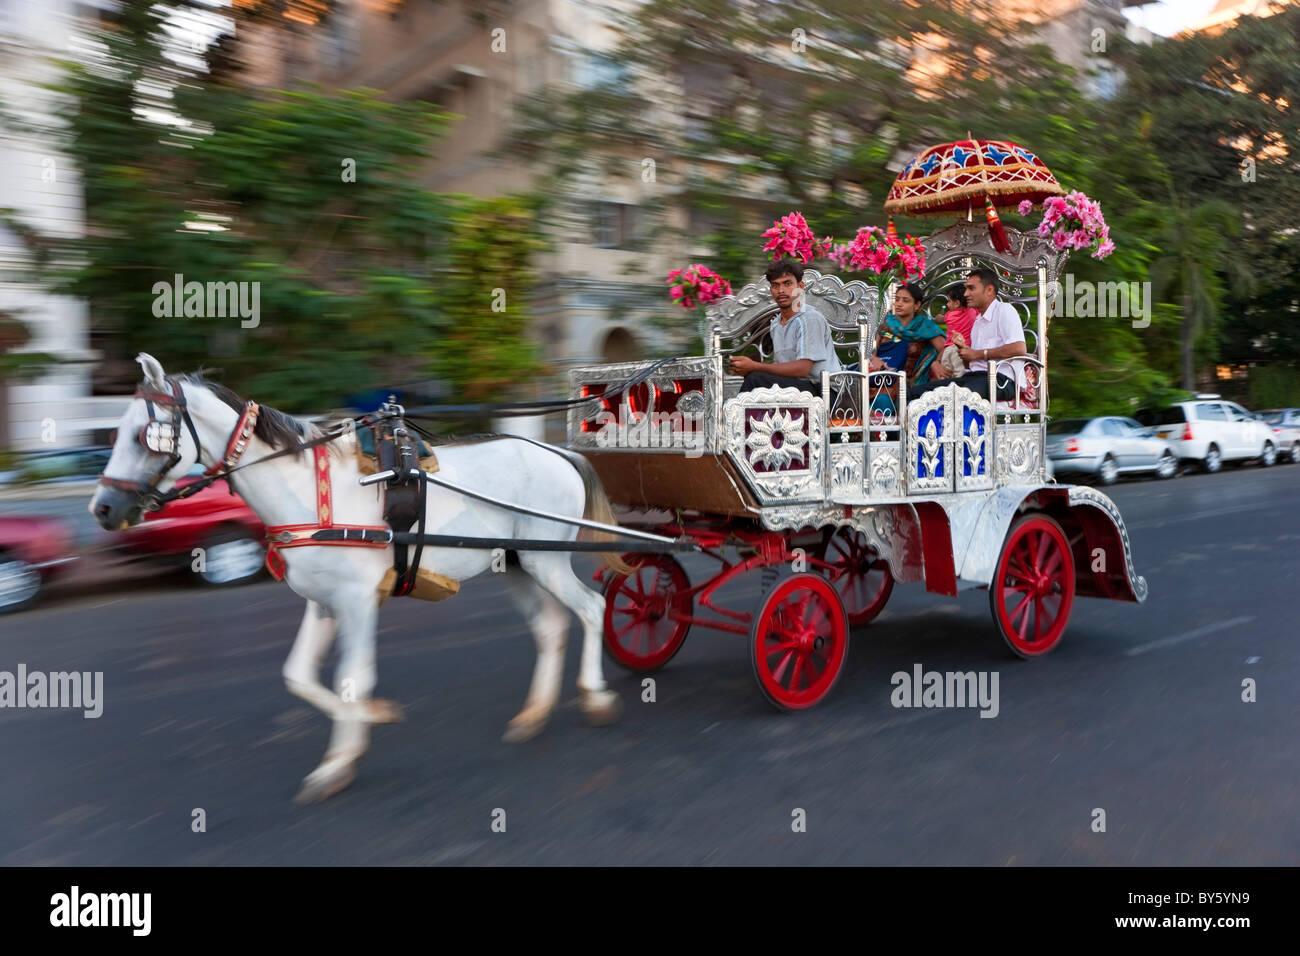 Carriage for tourist rides, Mumbai, (Bombay), India - Stock Image